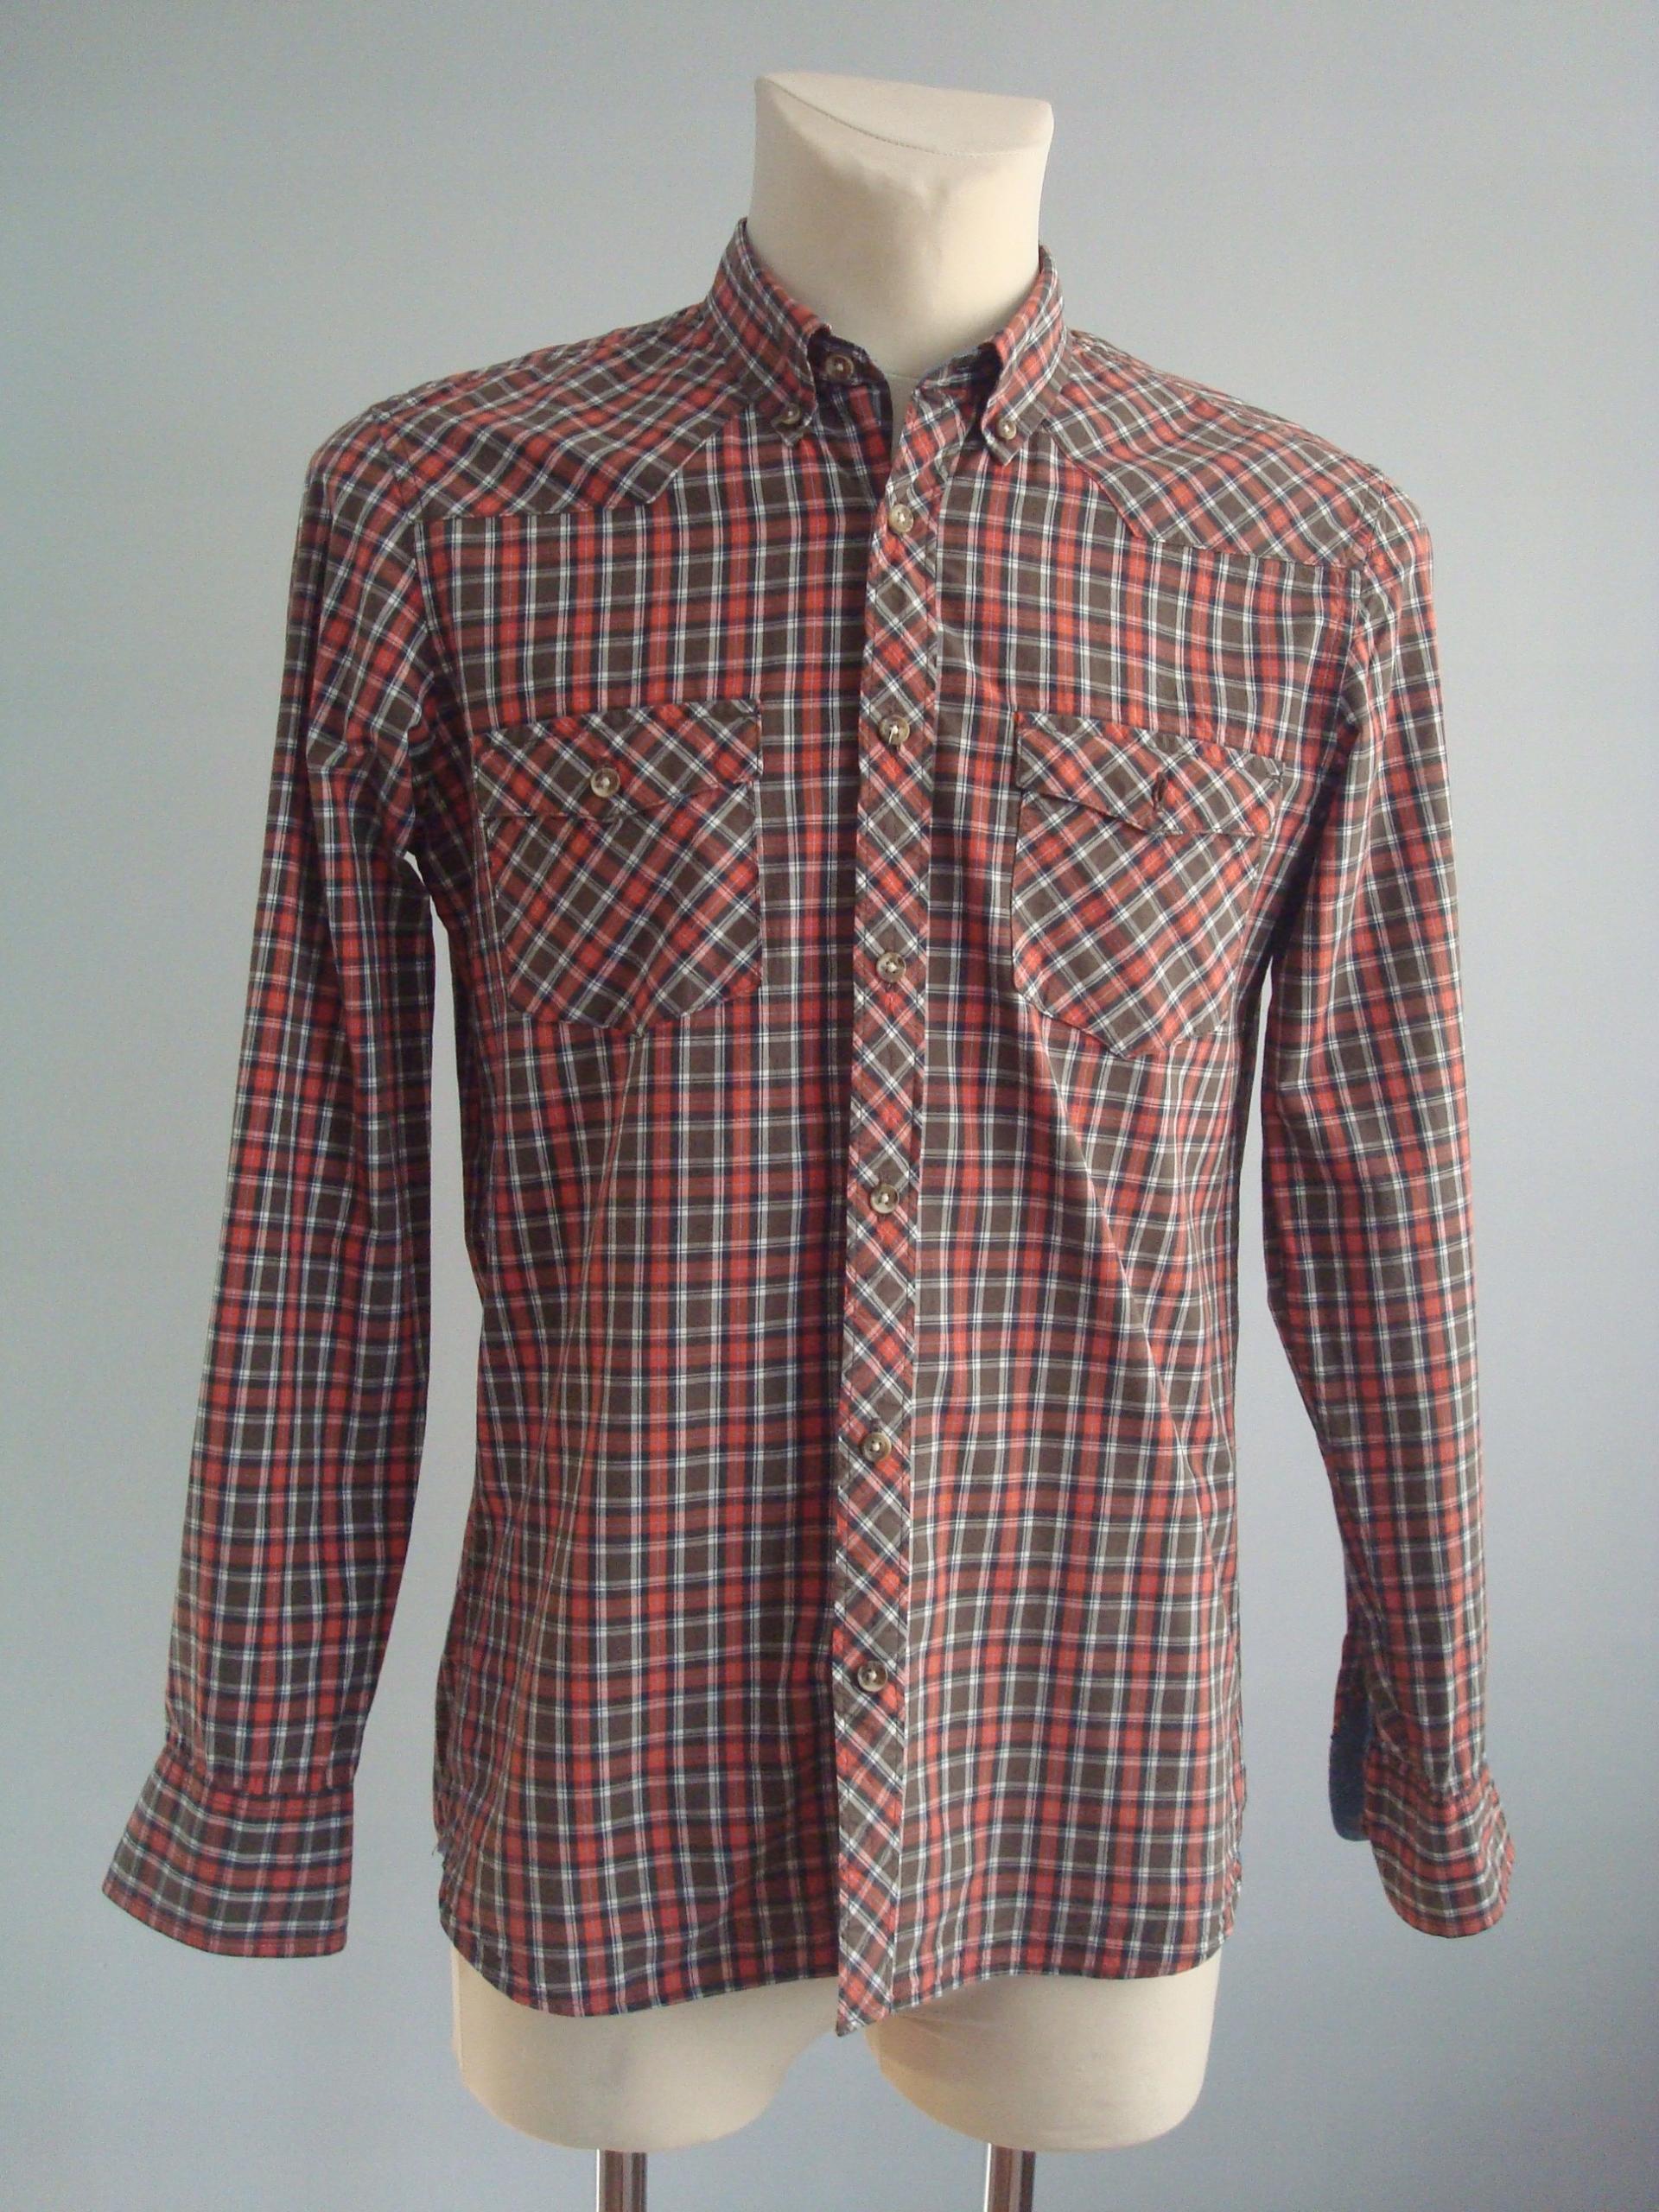 L.O.G.G. H&M koszula męska krata M